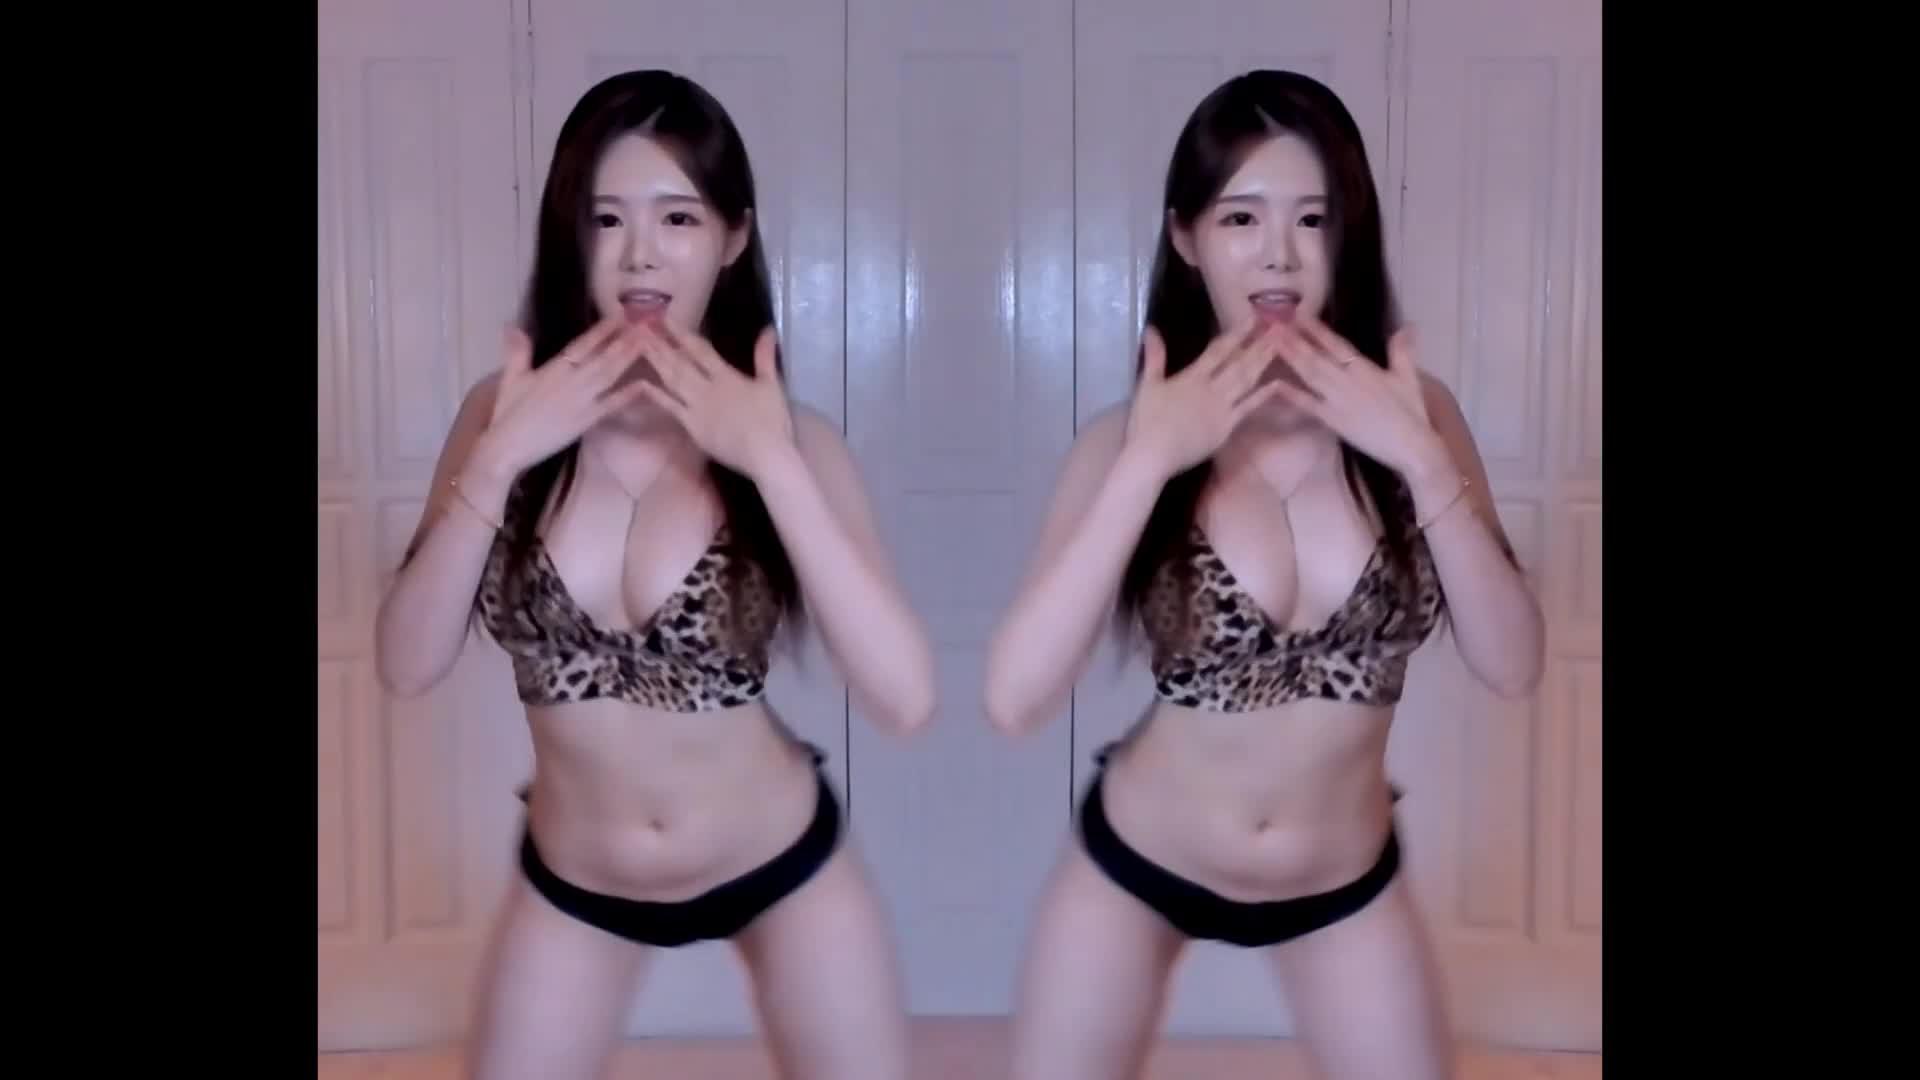 [HOT] FANCAM 직캠 BJ햄찡 HAMJJING _ SEXY Dance @ 여캠 KOREAN 섹시 댄스